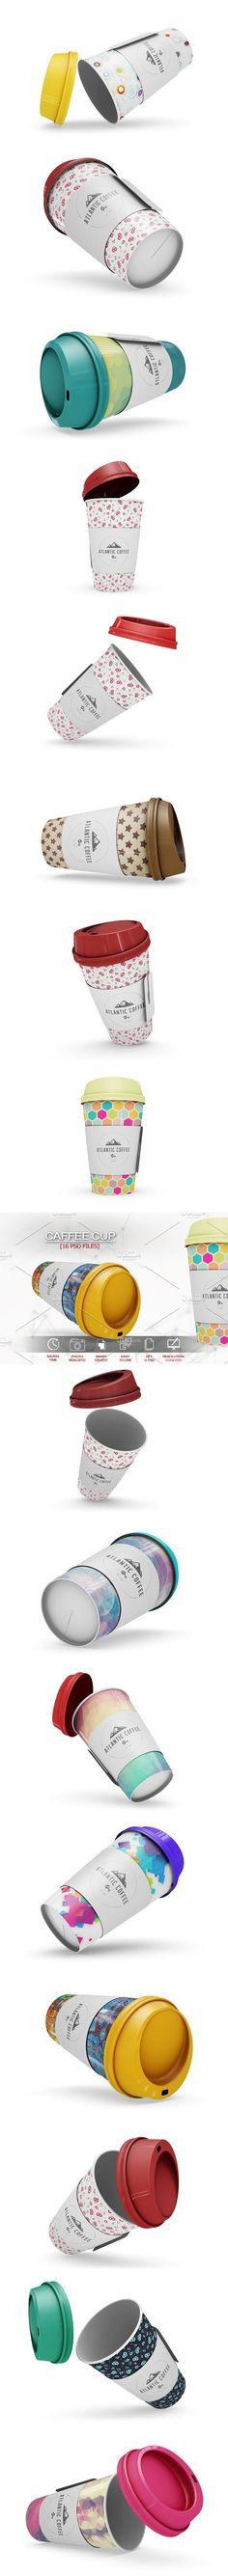 Coffee Cup Vol.1Mockup. Branding Tips